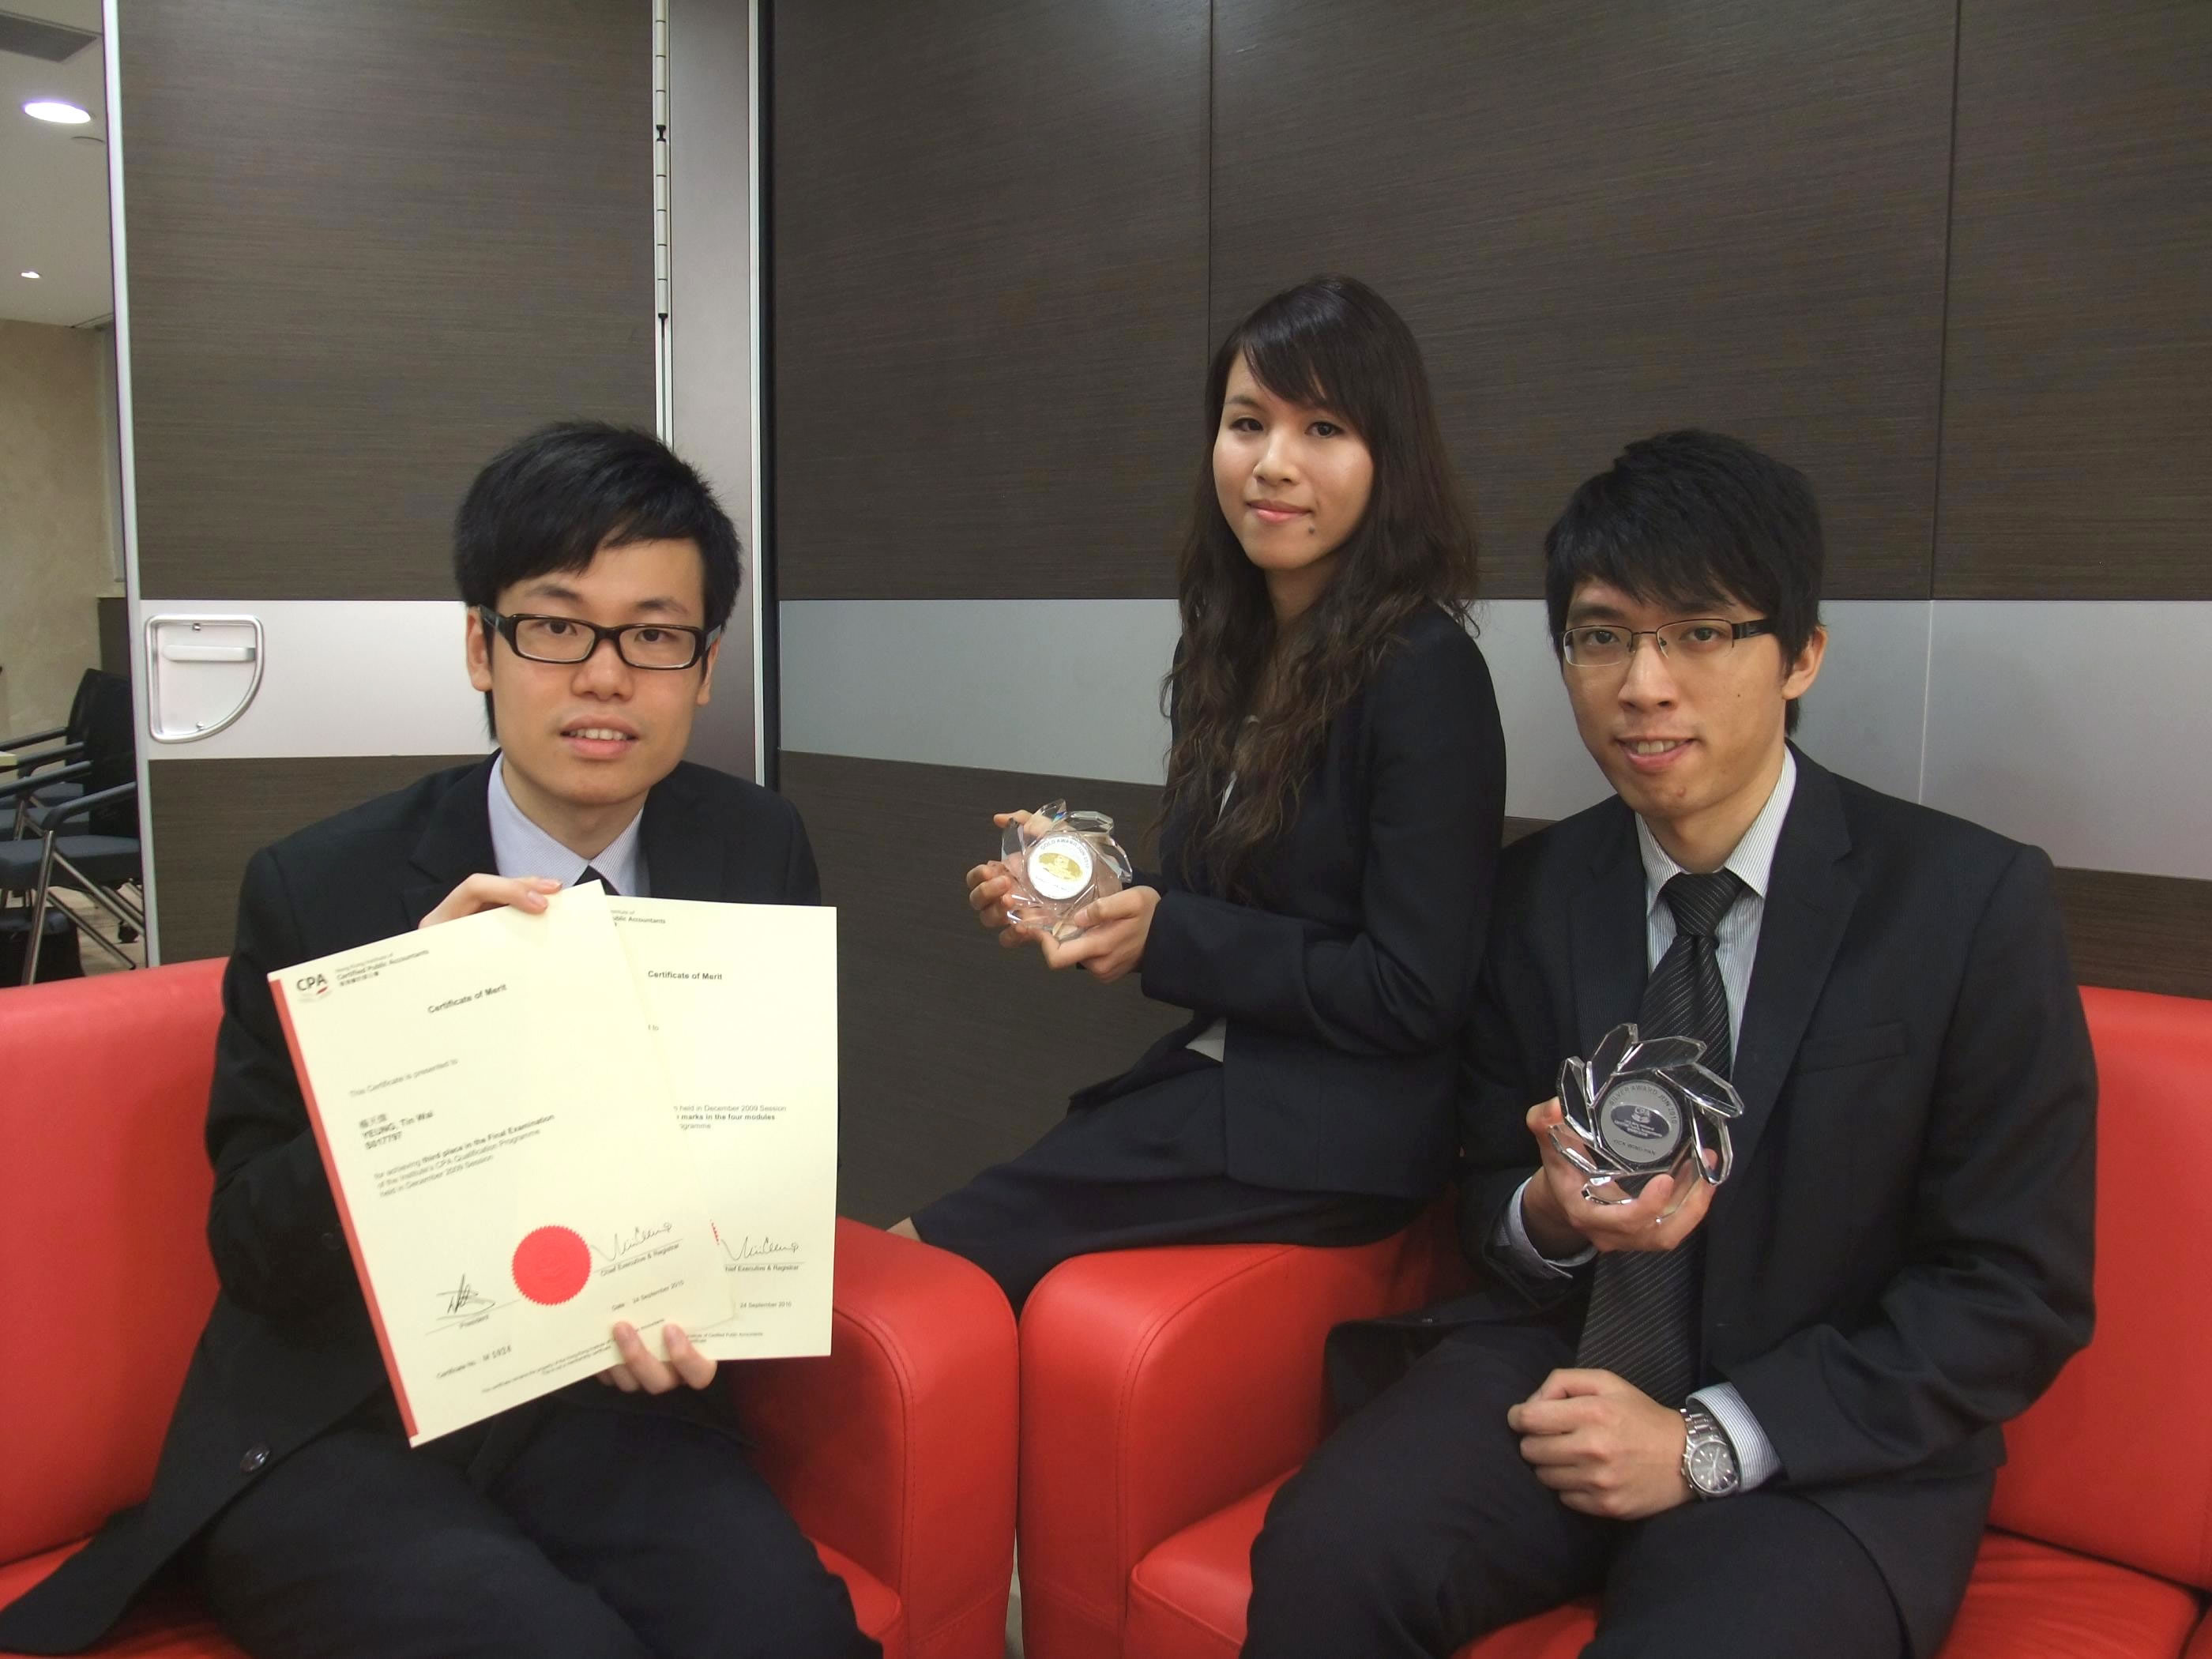 (From left) Mr. Yeung Tin Wai, Ms. Kwong Wai Nga and Mr. Yick Wing Pan